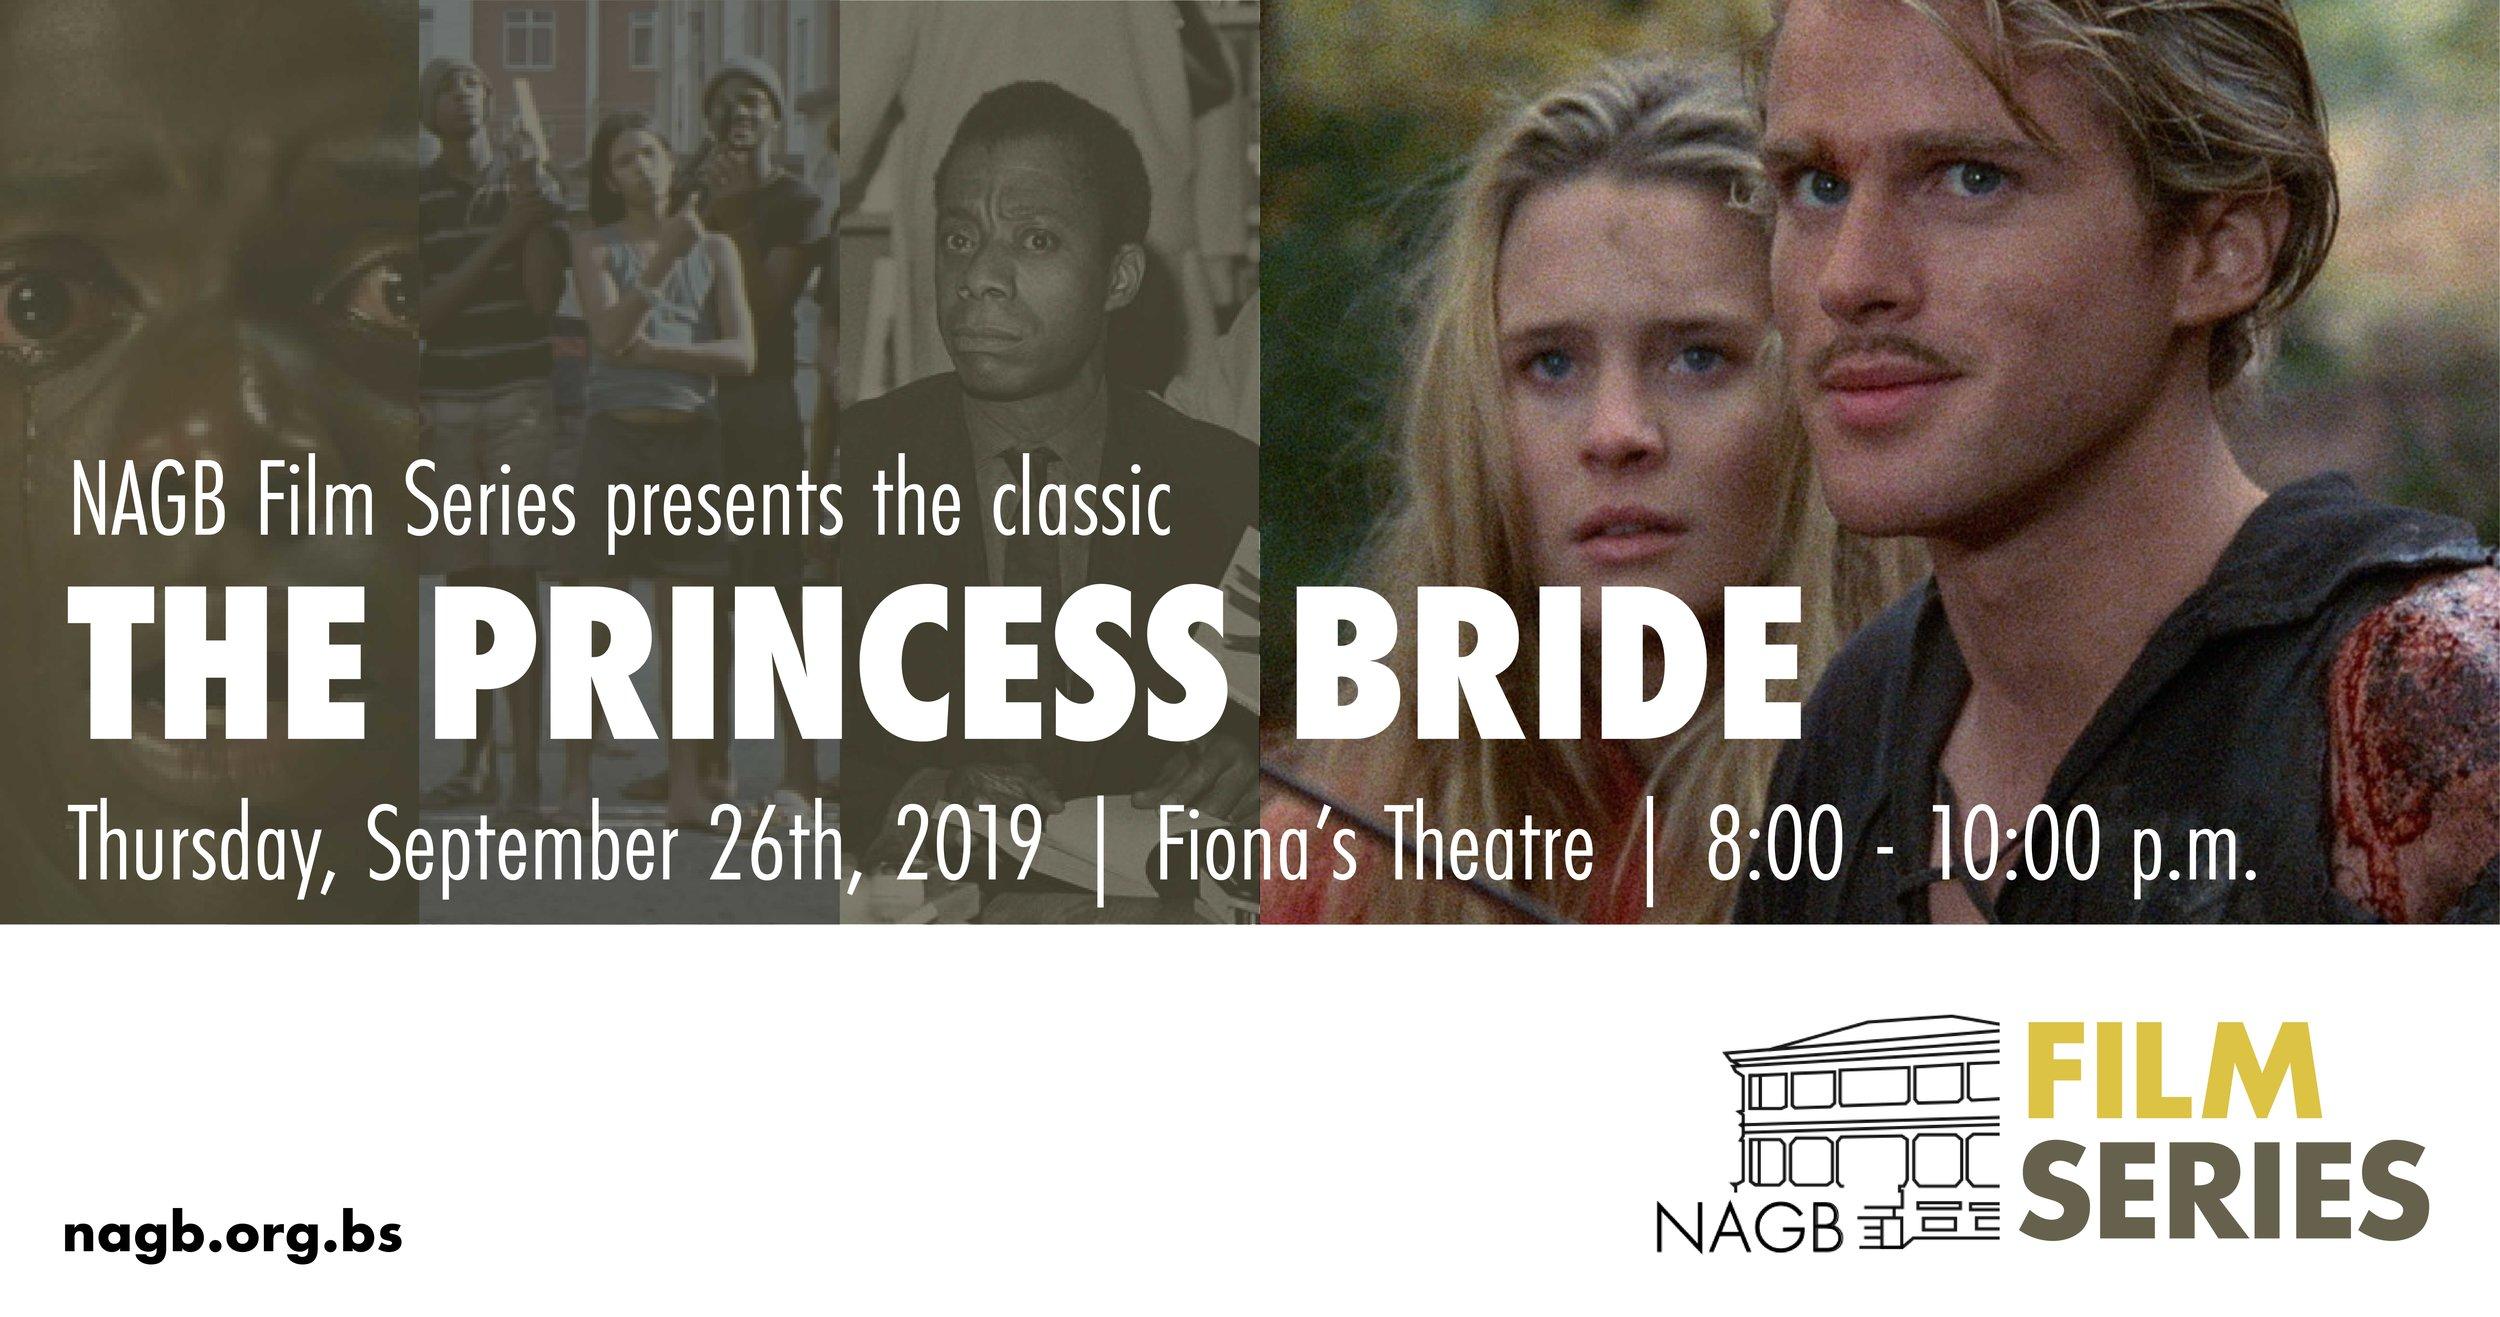 Film_Series_The_Princess_Bride_Horizontal.jpg